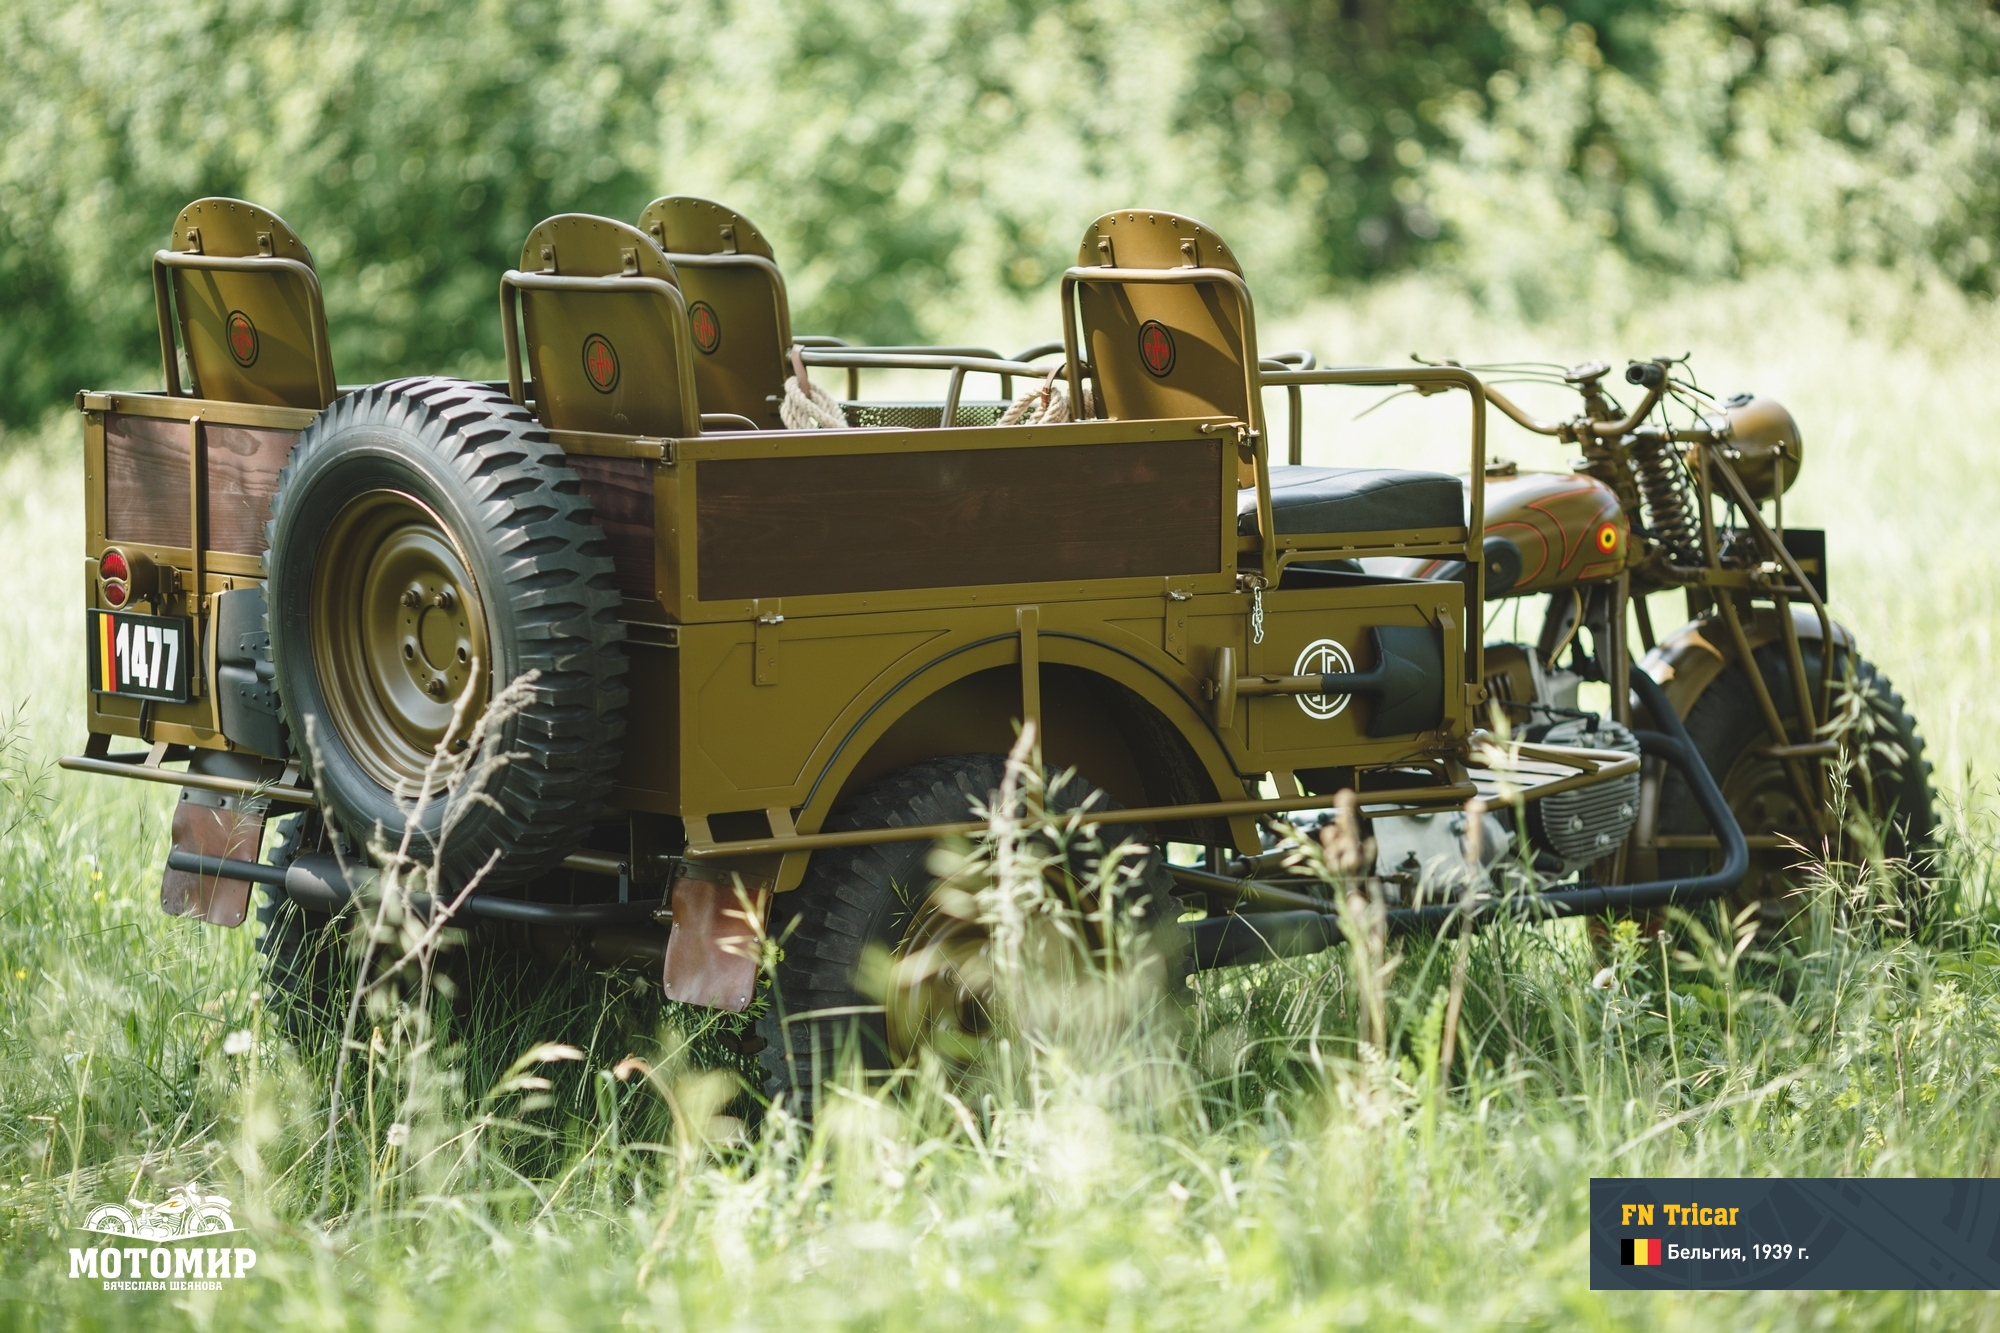 fn-tricar-201506-web-05